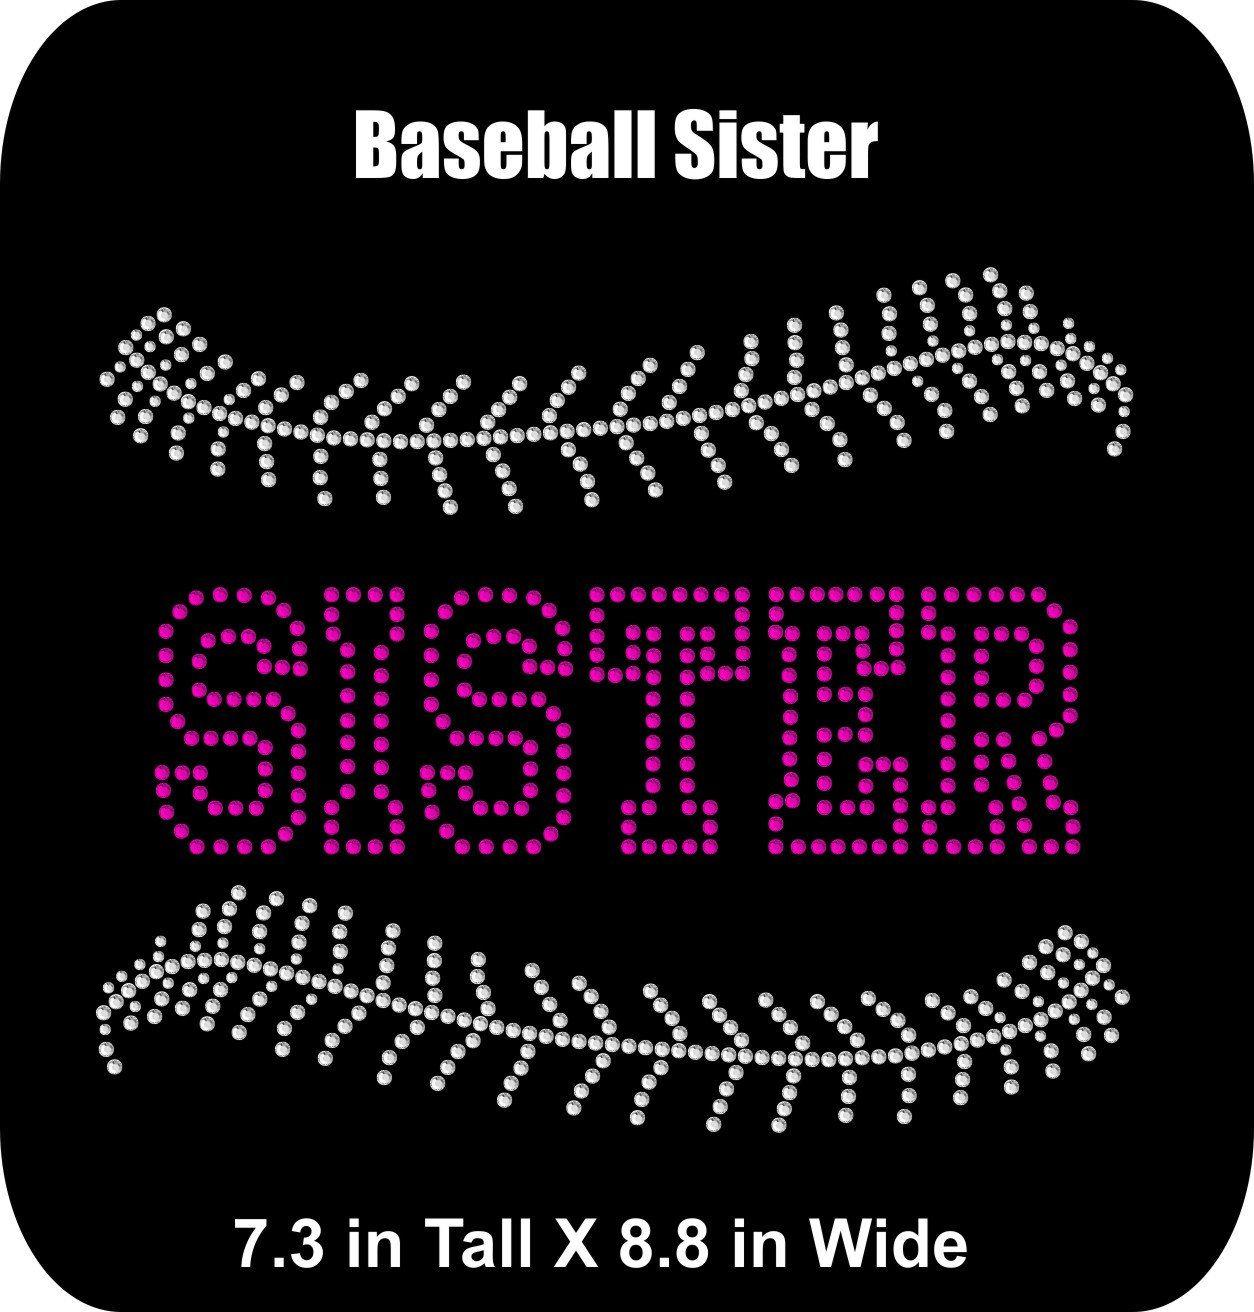 Rhinestone Bling Iron-on T-shirt Transfer Baseball Sister